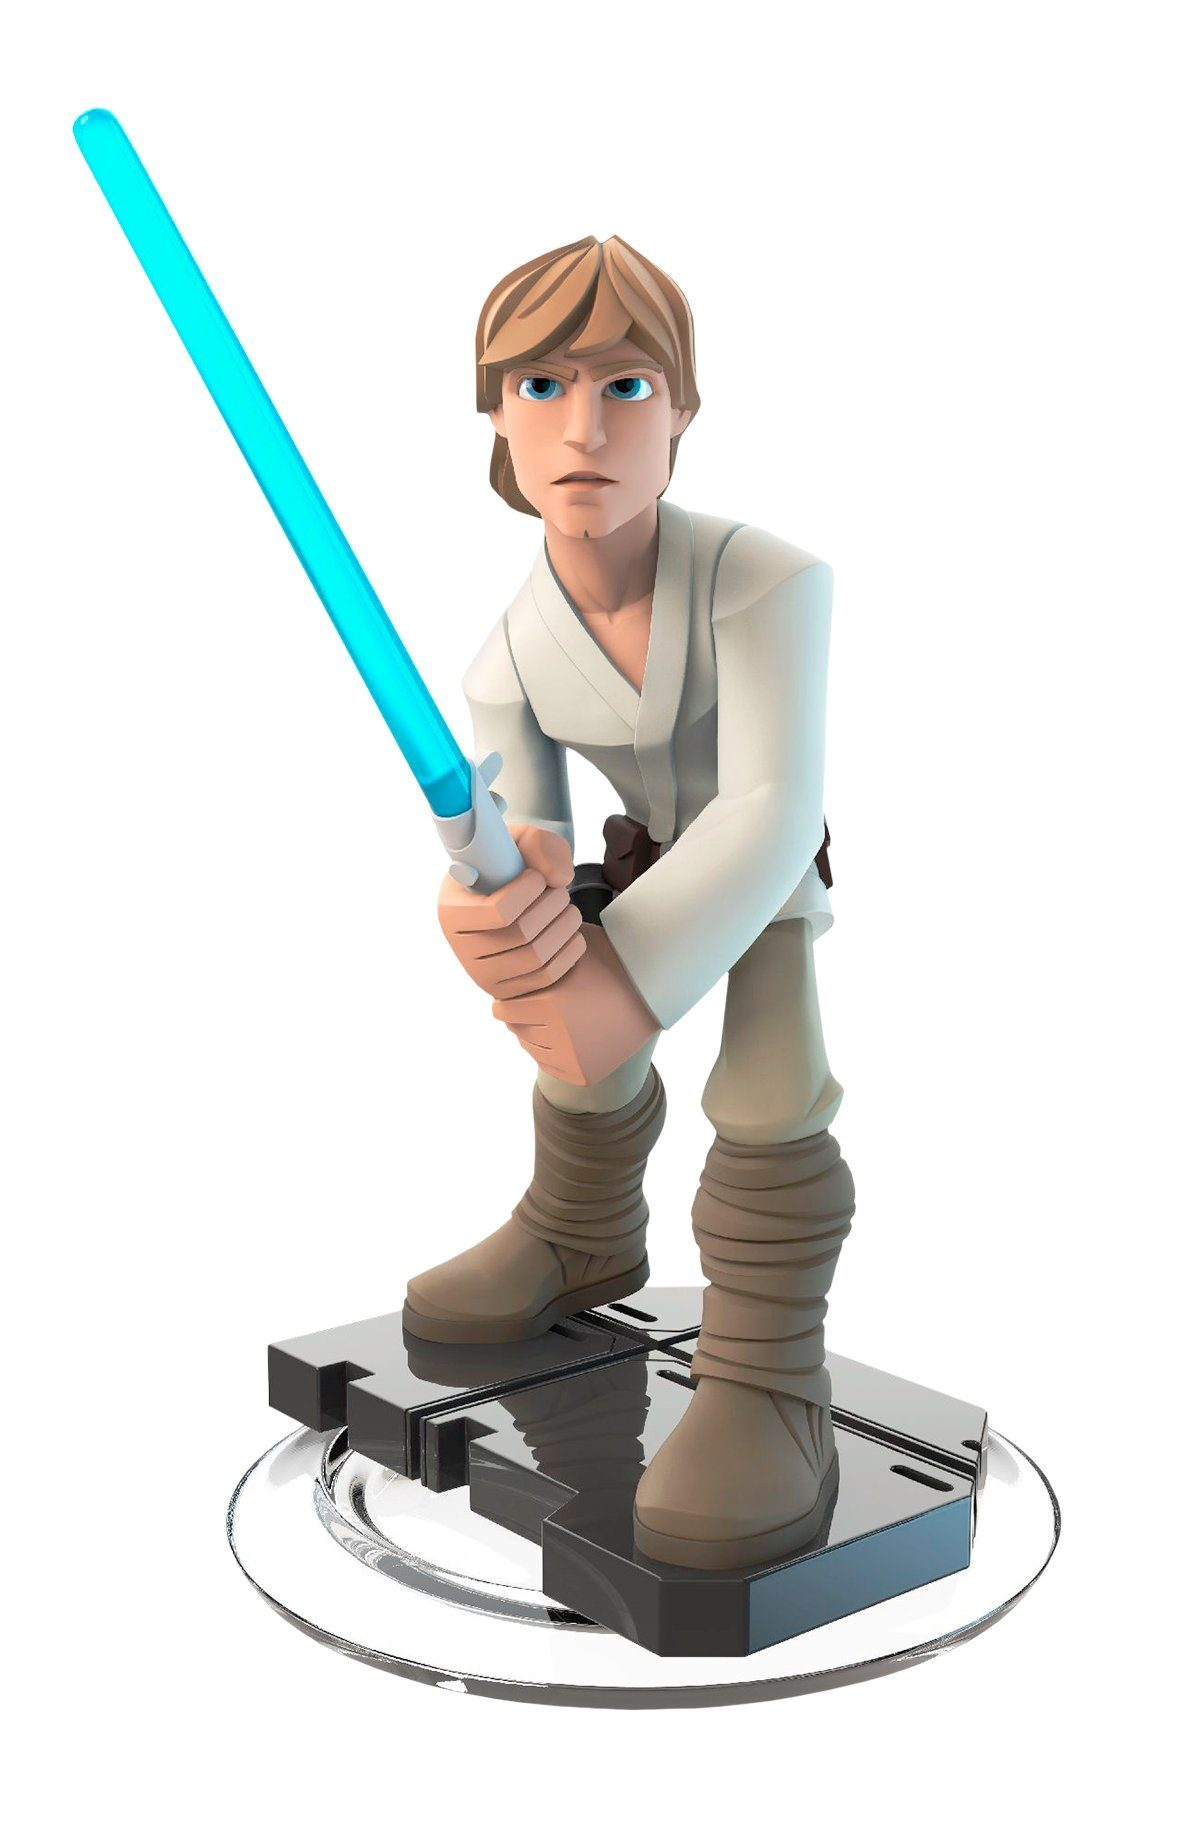 DISNEY Infinity 3.0 »Light FX Einzelfigur Luke Skywalker«